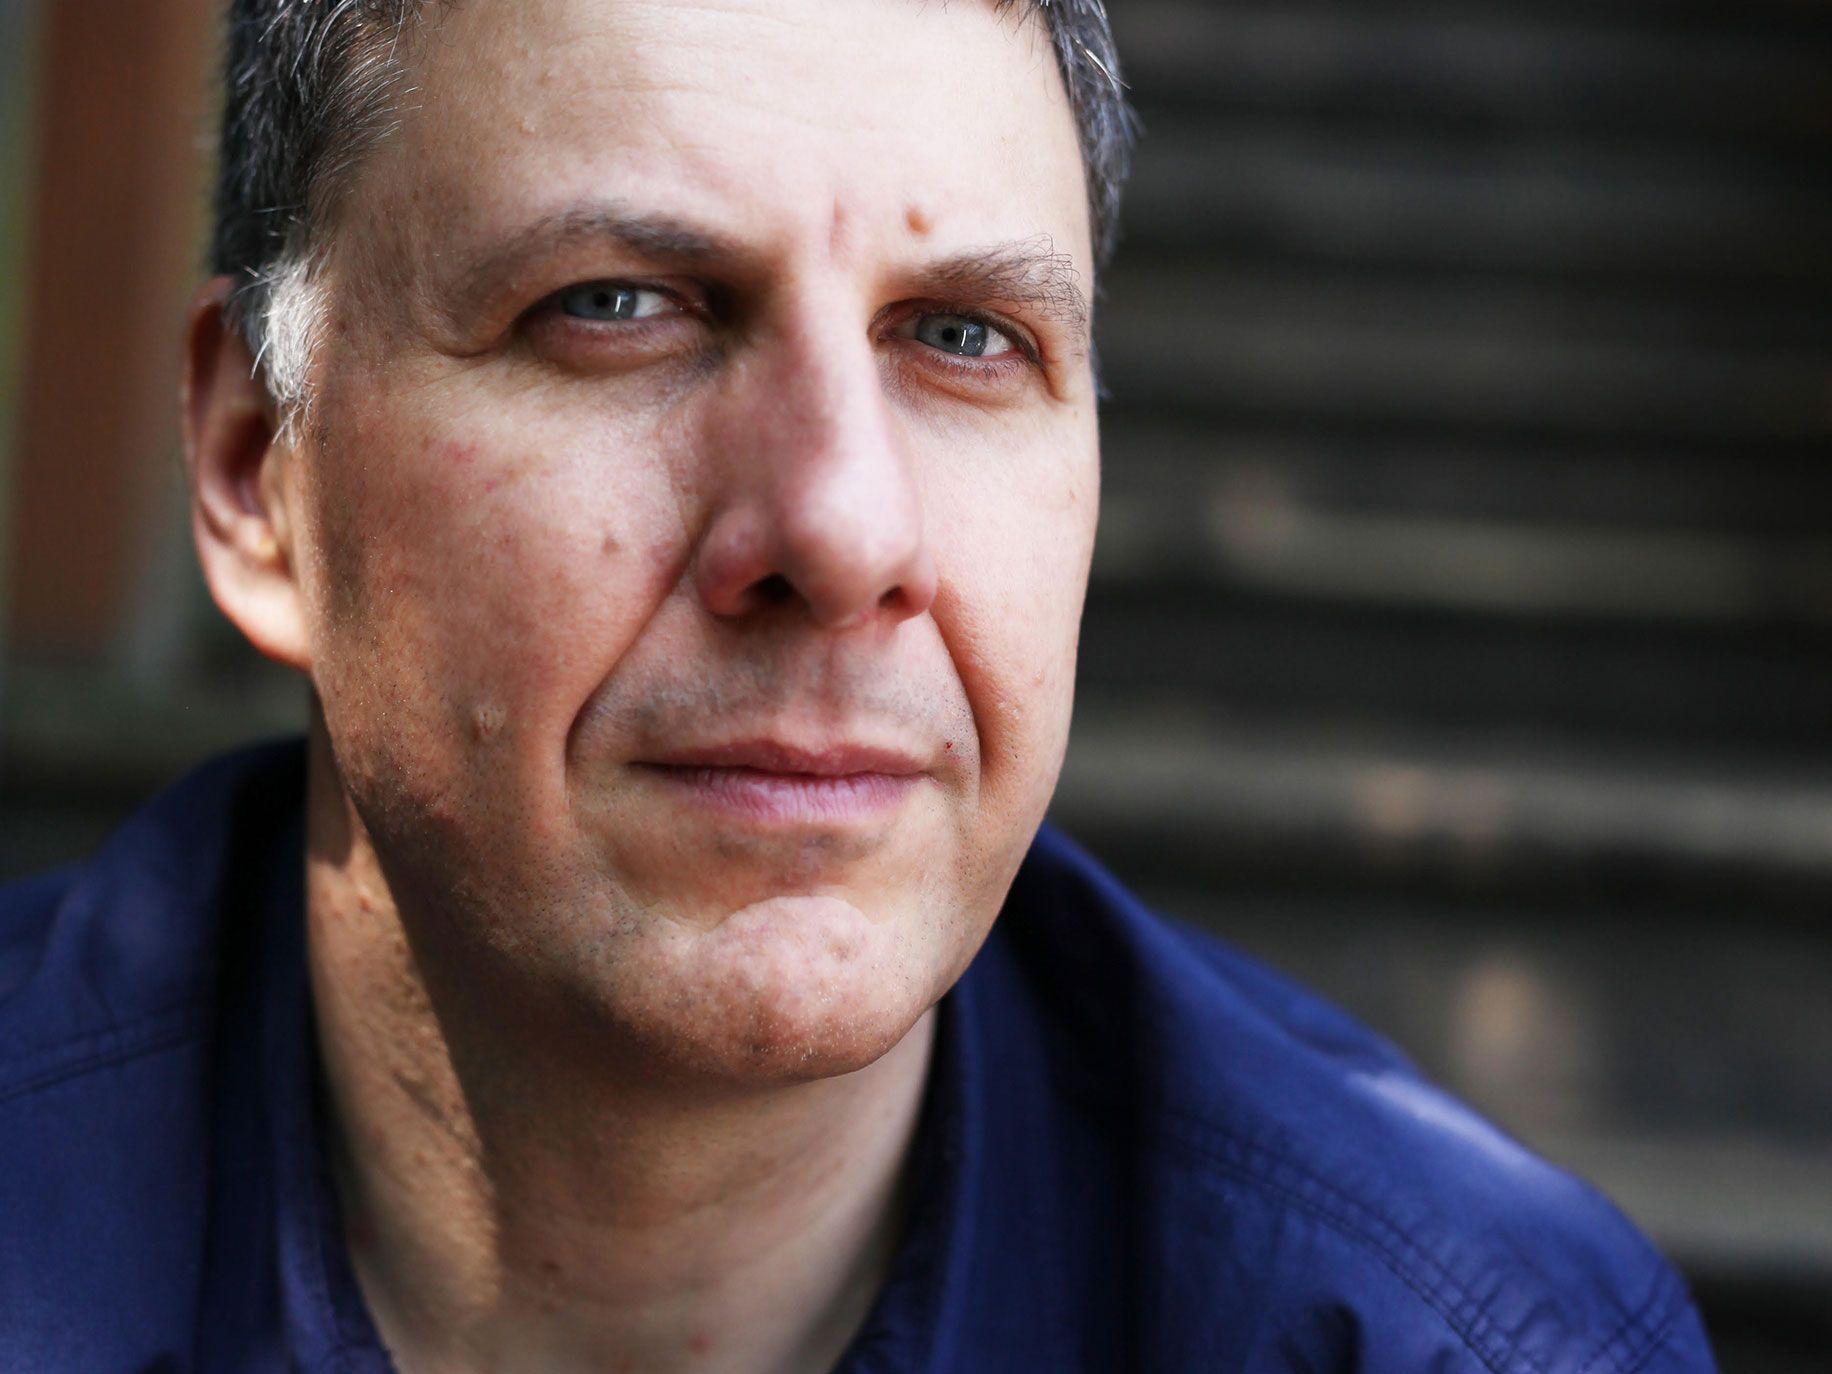 Father's Day author Matthew Zapruder